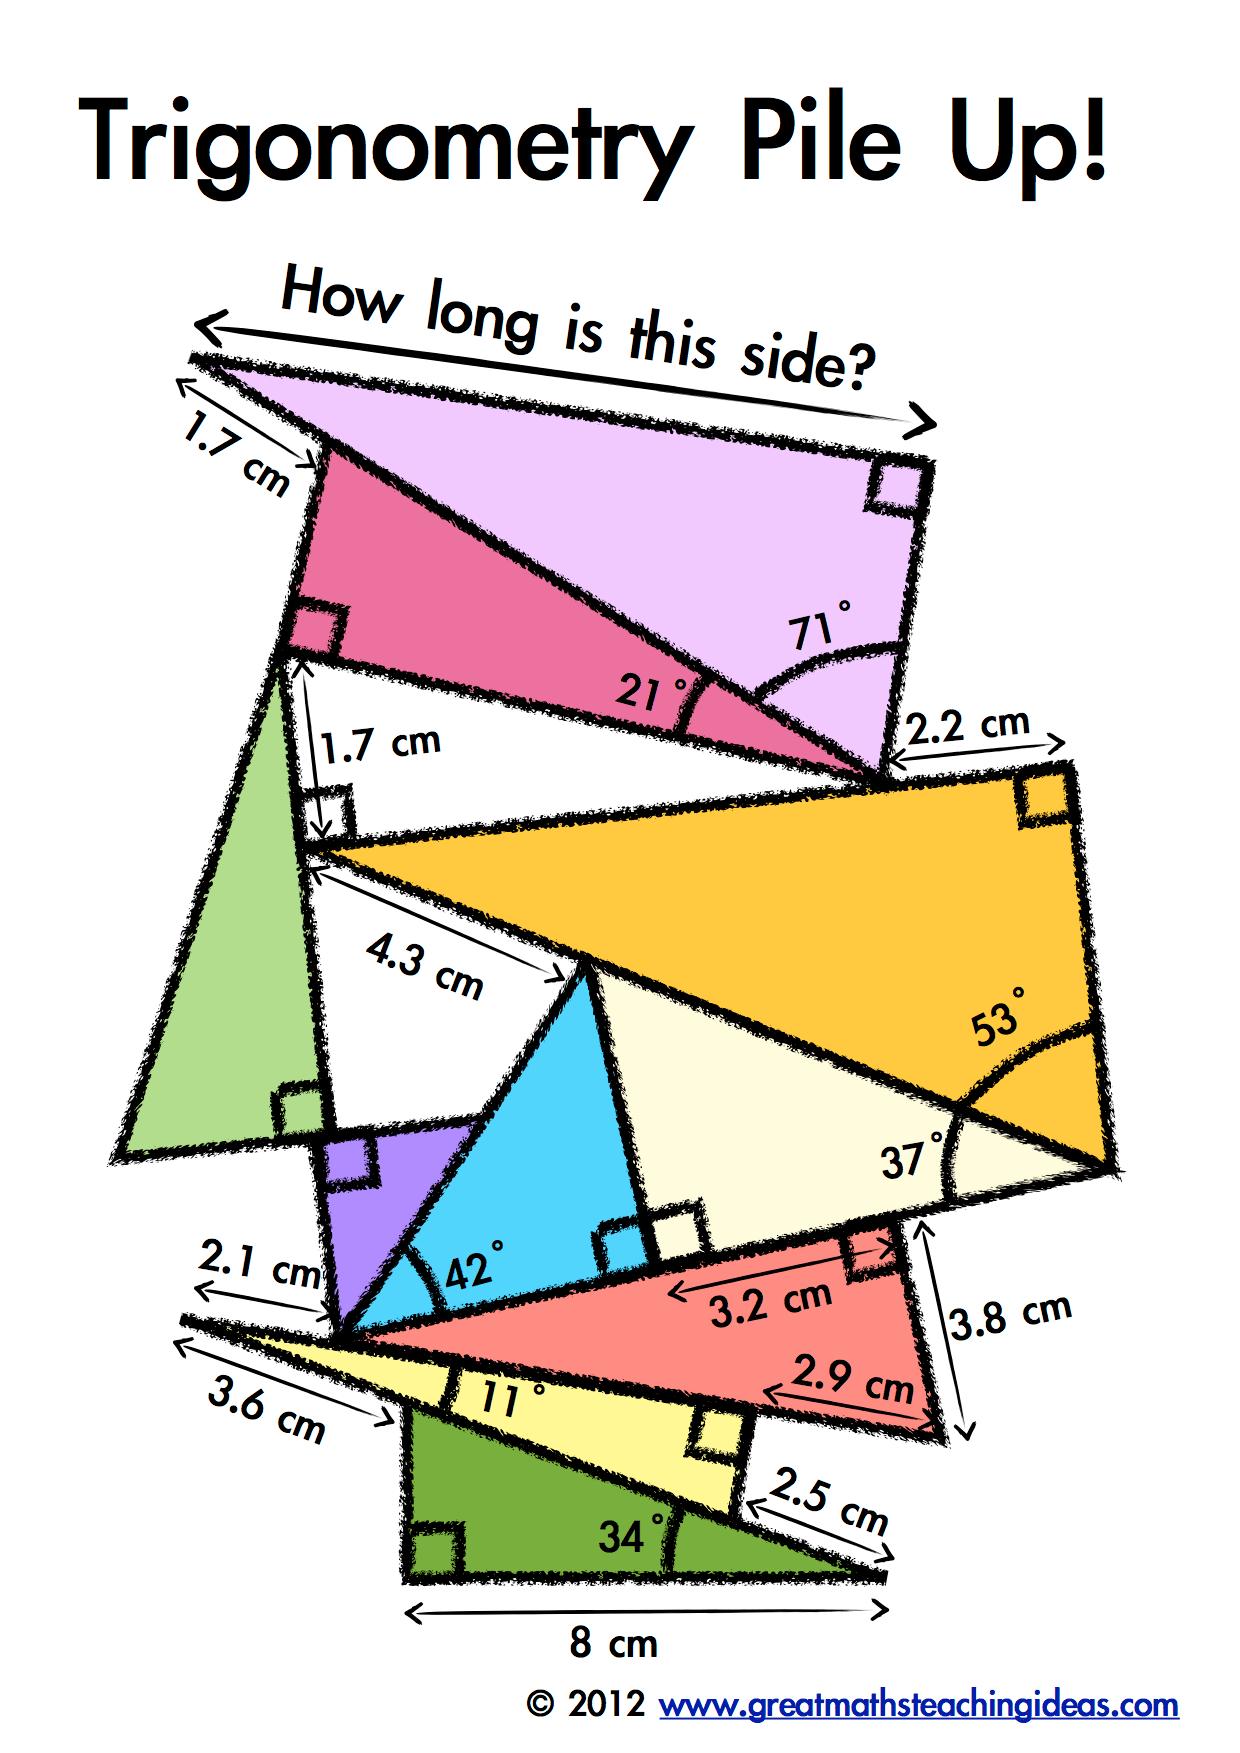 Trigonometry Pile Up